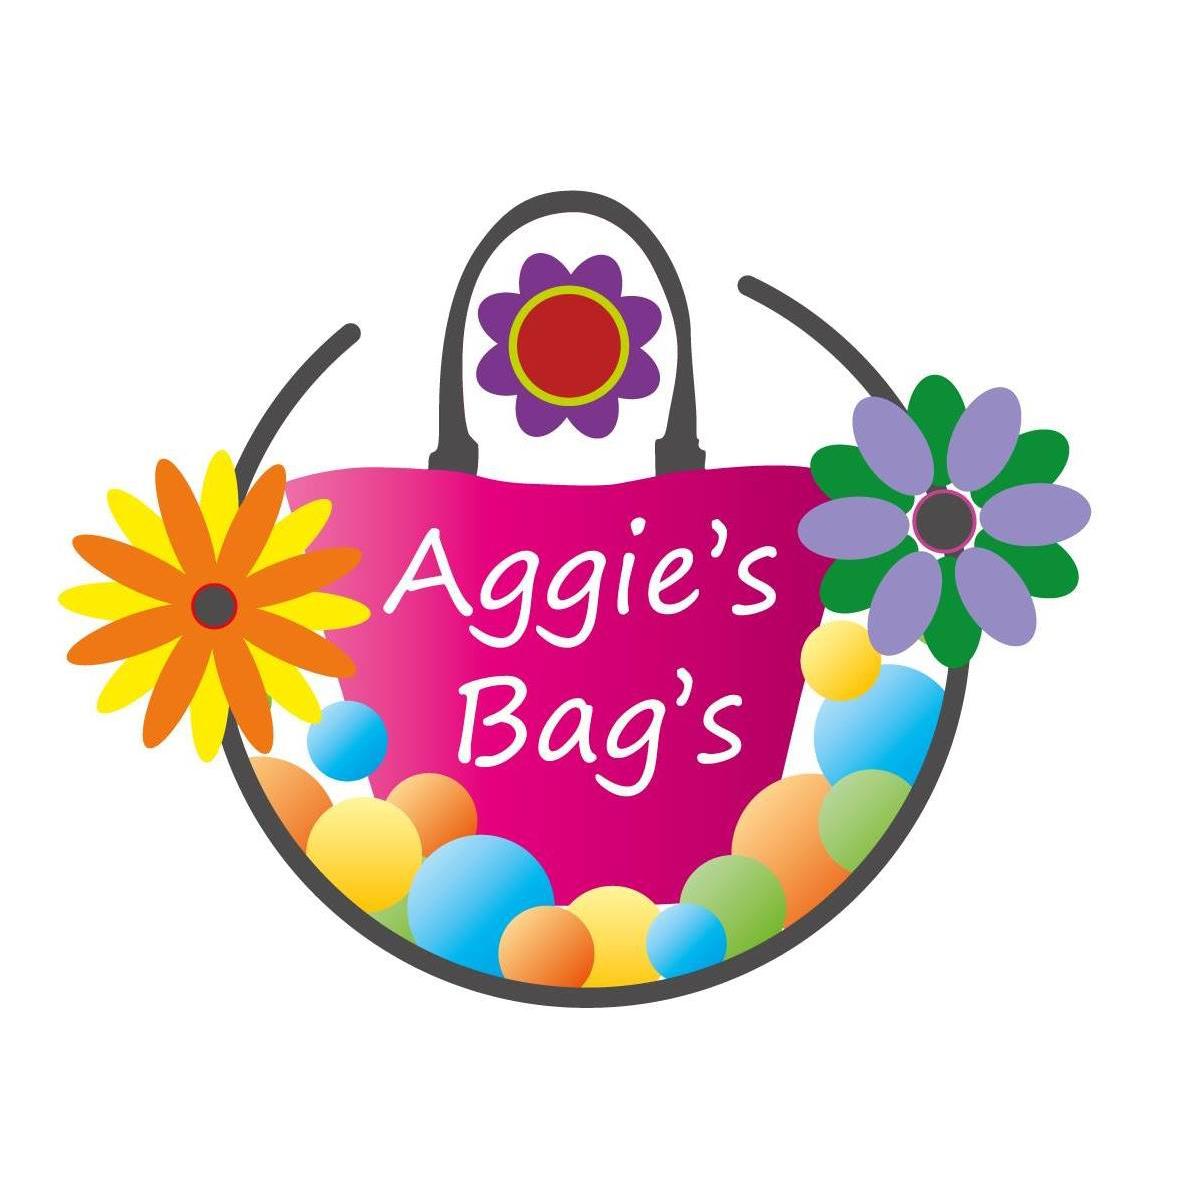 Aggies Bags.jpg